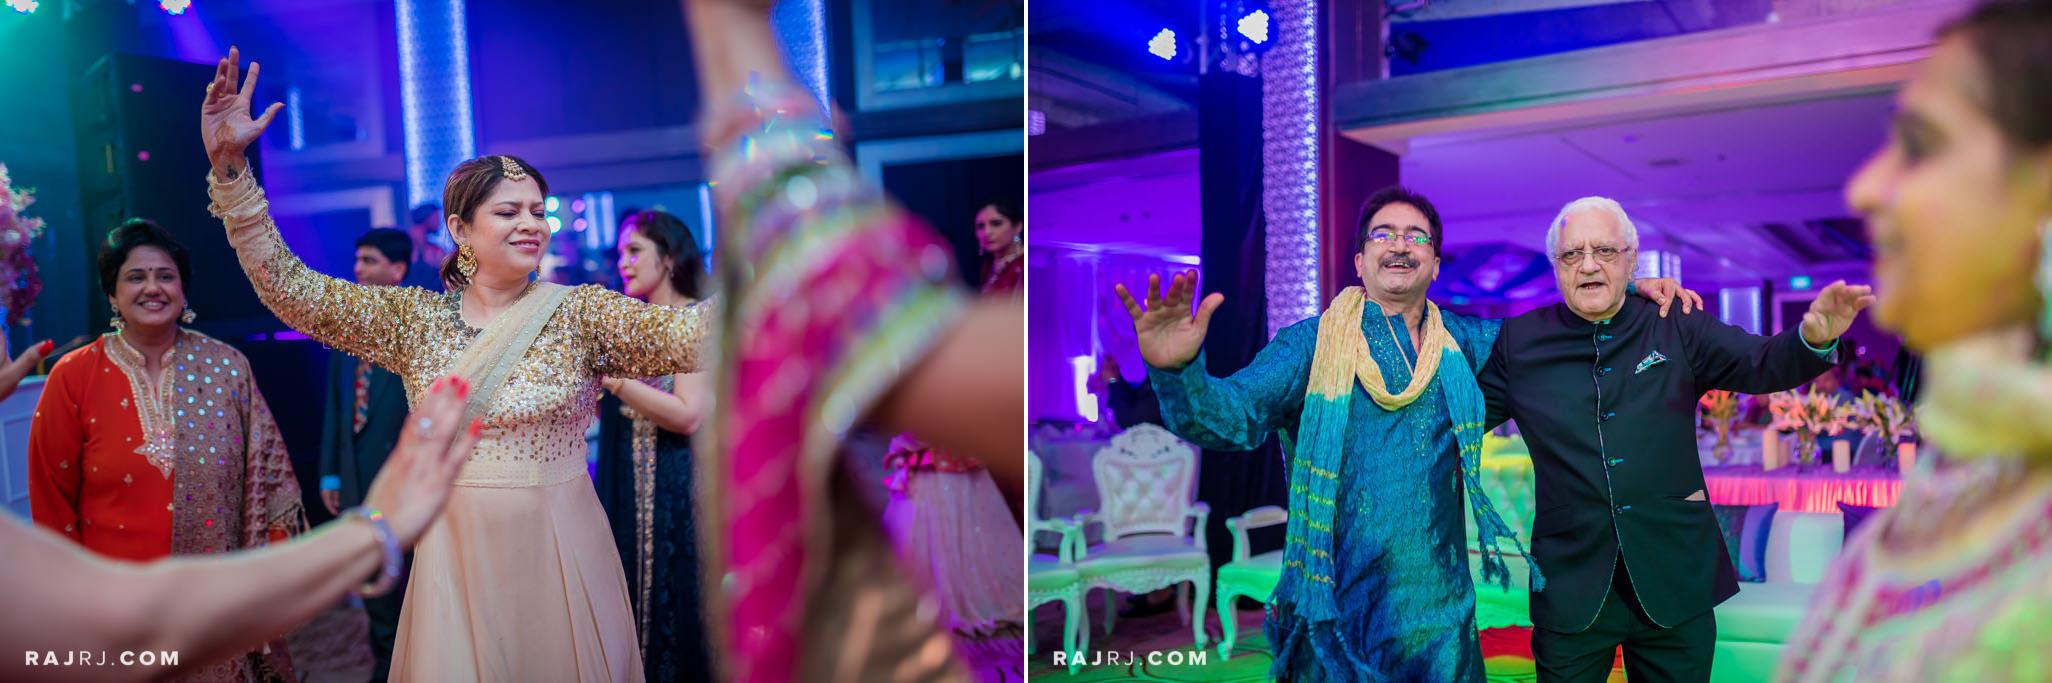 RAJ_THAILAND_WEDDING_PHOTOGRAPHY-30_1.jpg